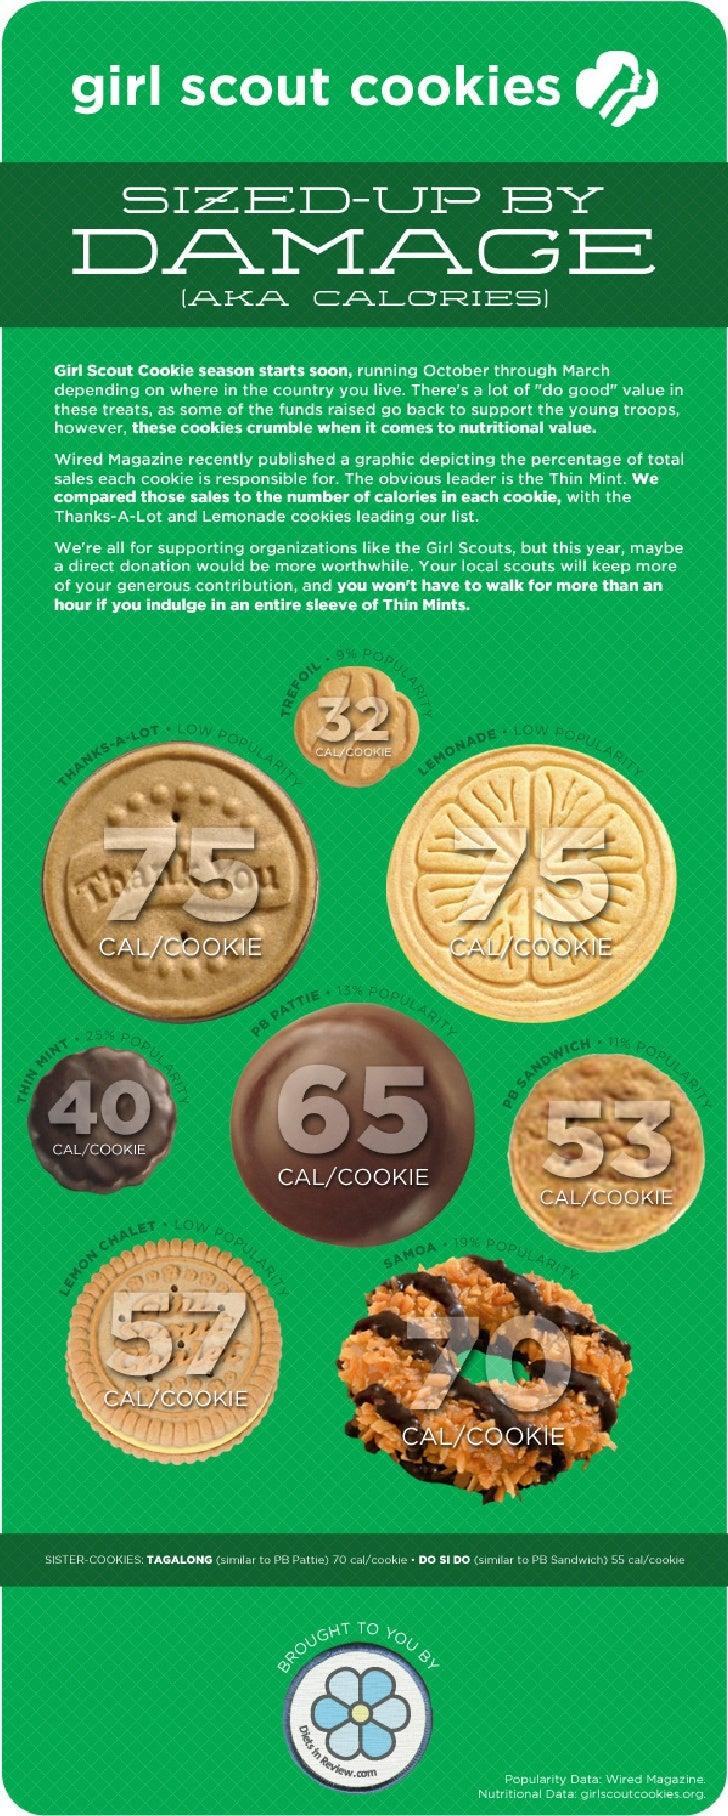 Girl Scout Cookies: Calories vs. Popularity